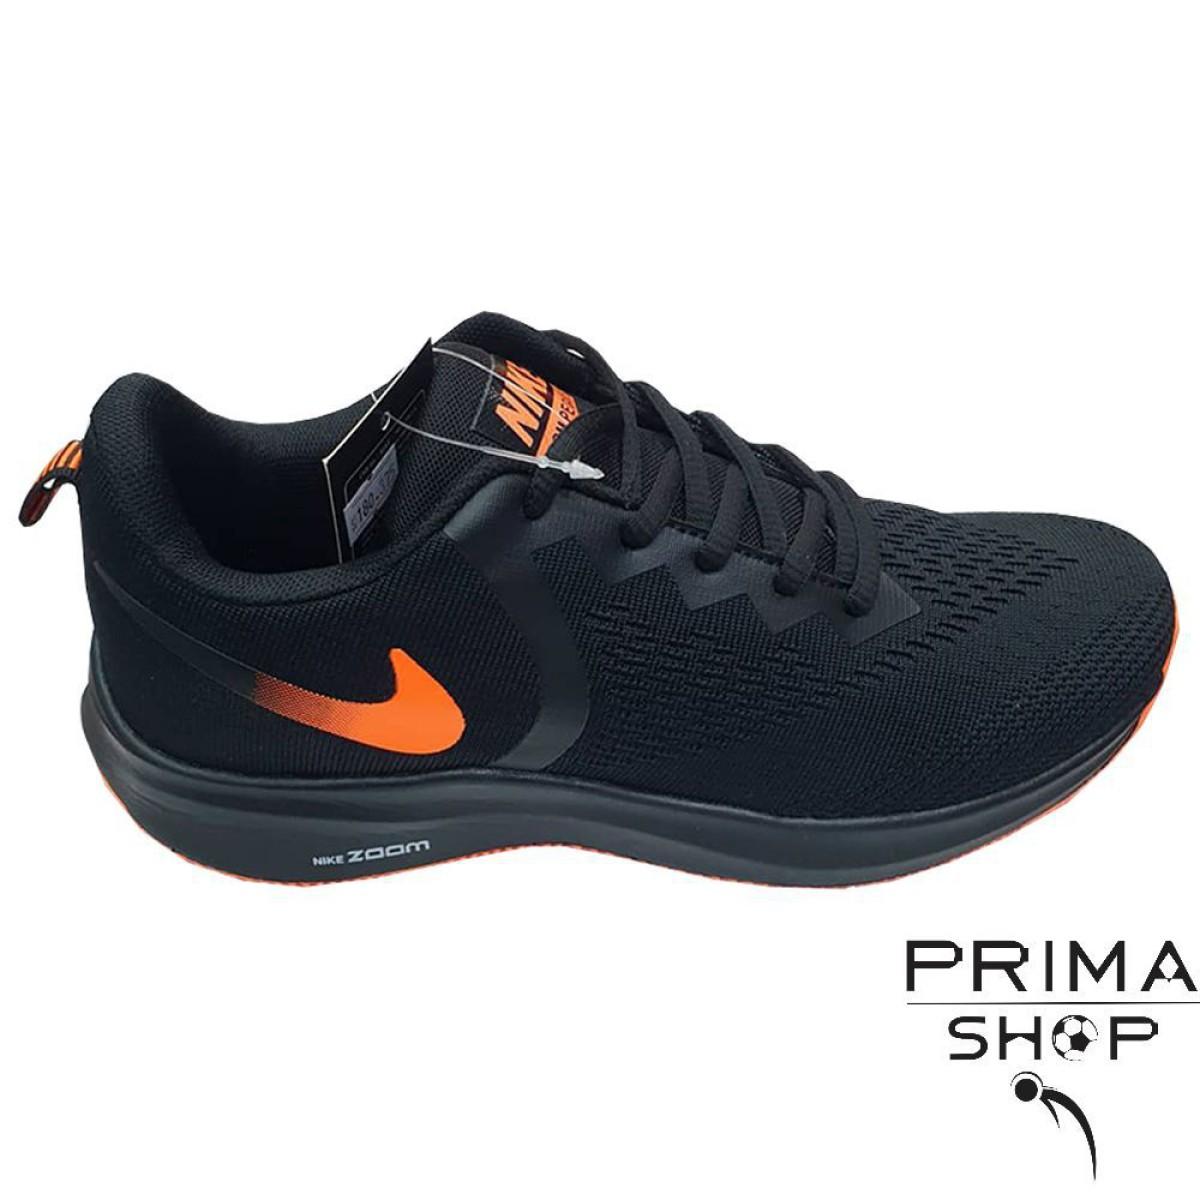 کفش اسپرت نایک مردانه کد 07 (های کپی)